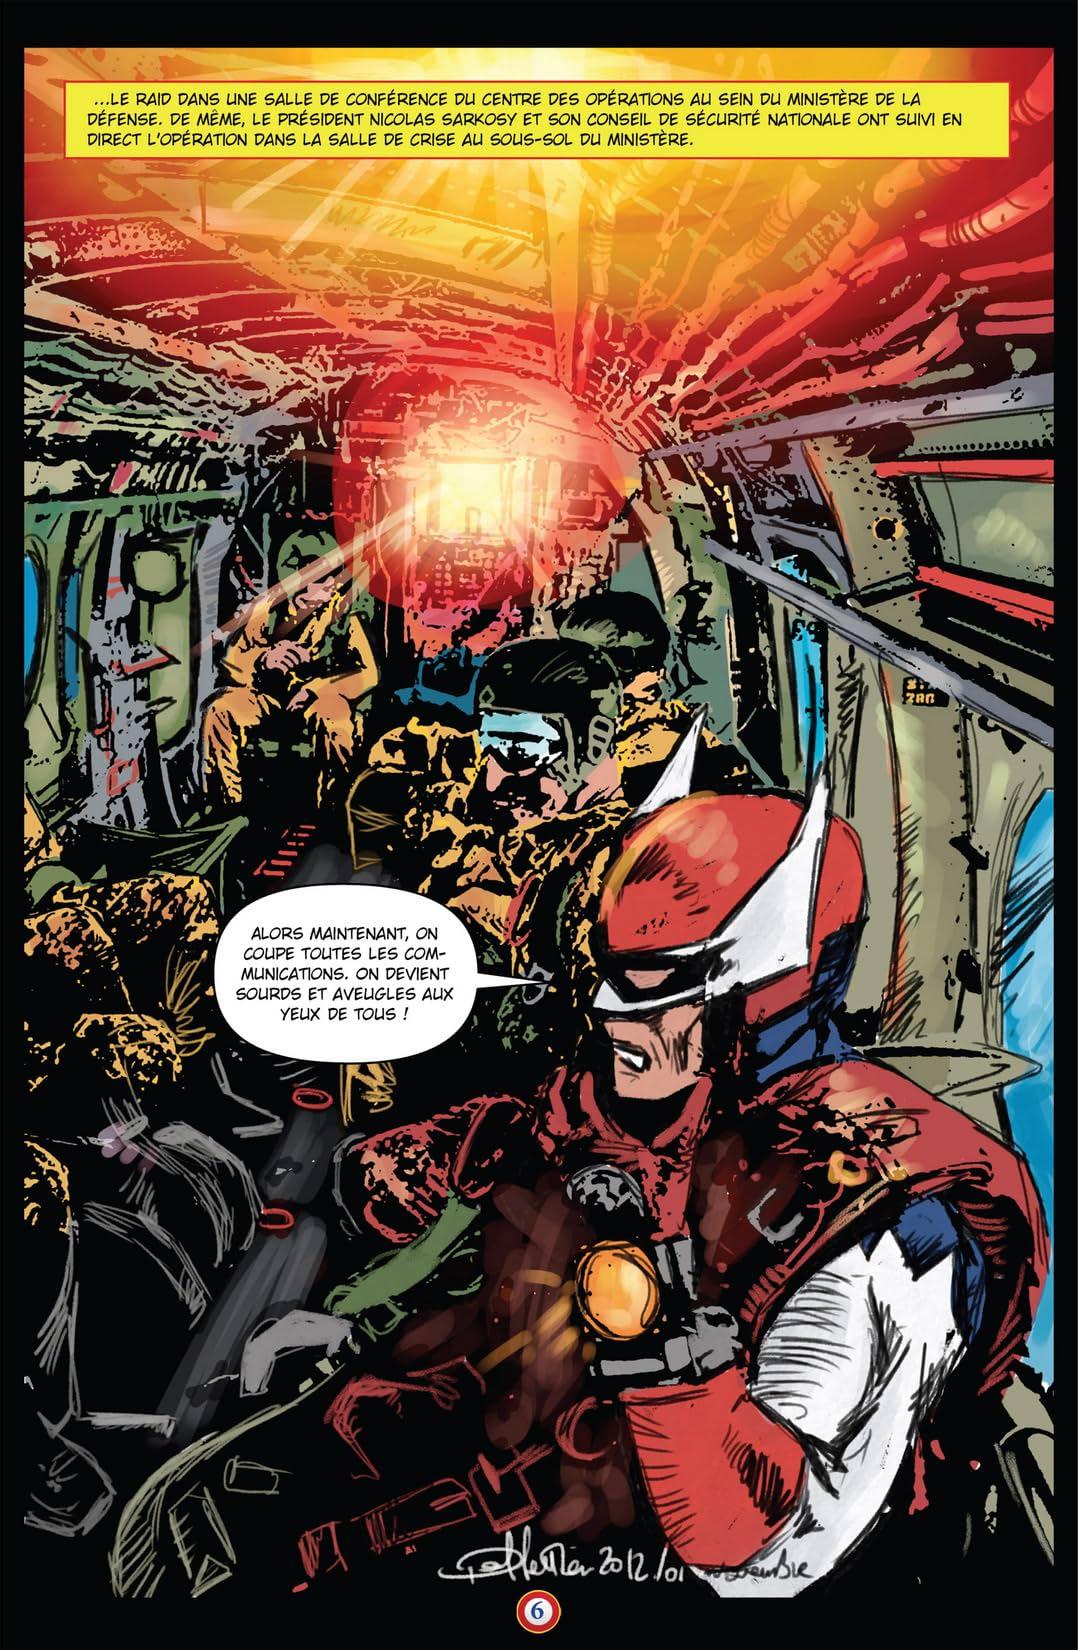 Le Coq Gaulois Vol. 1: The First Patriot